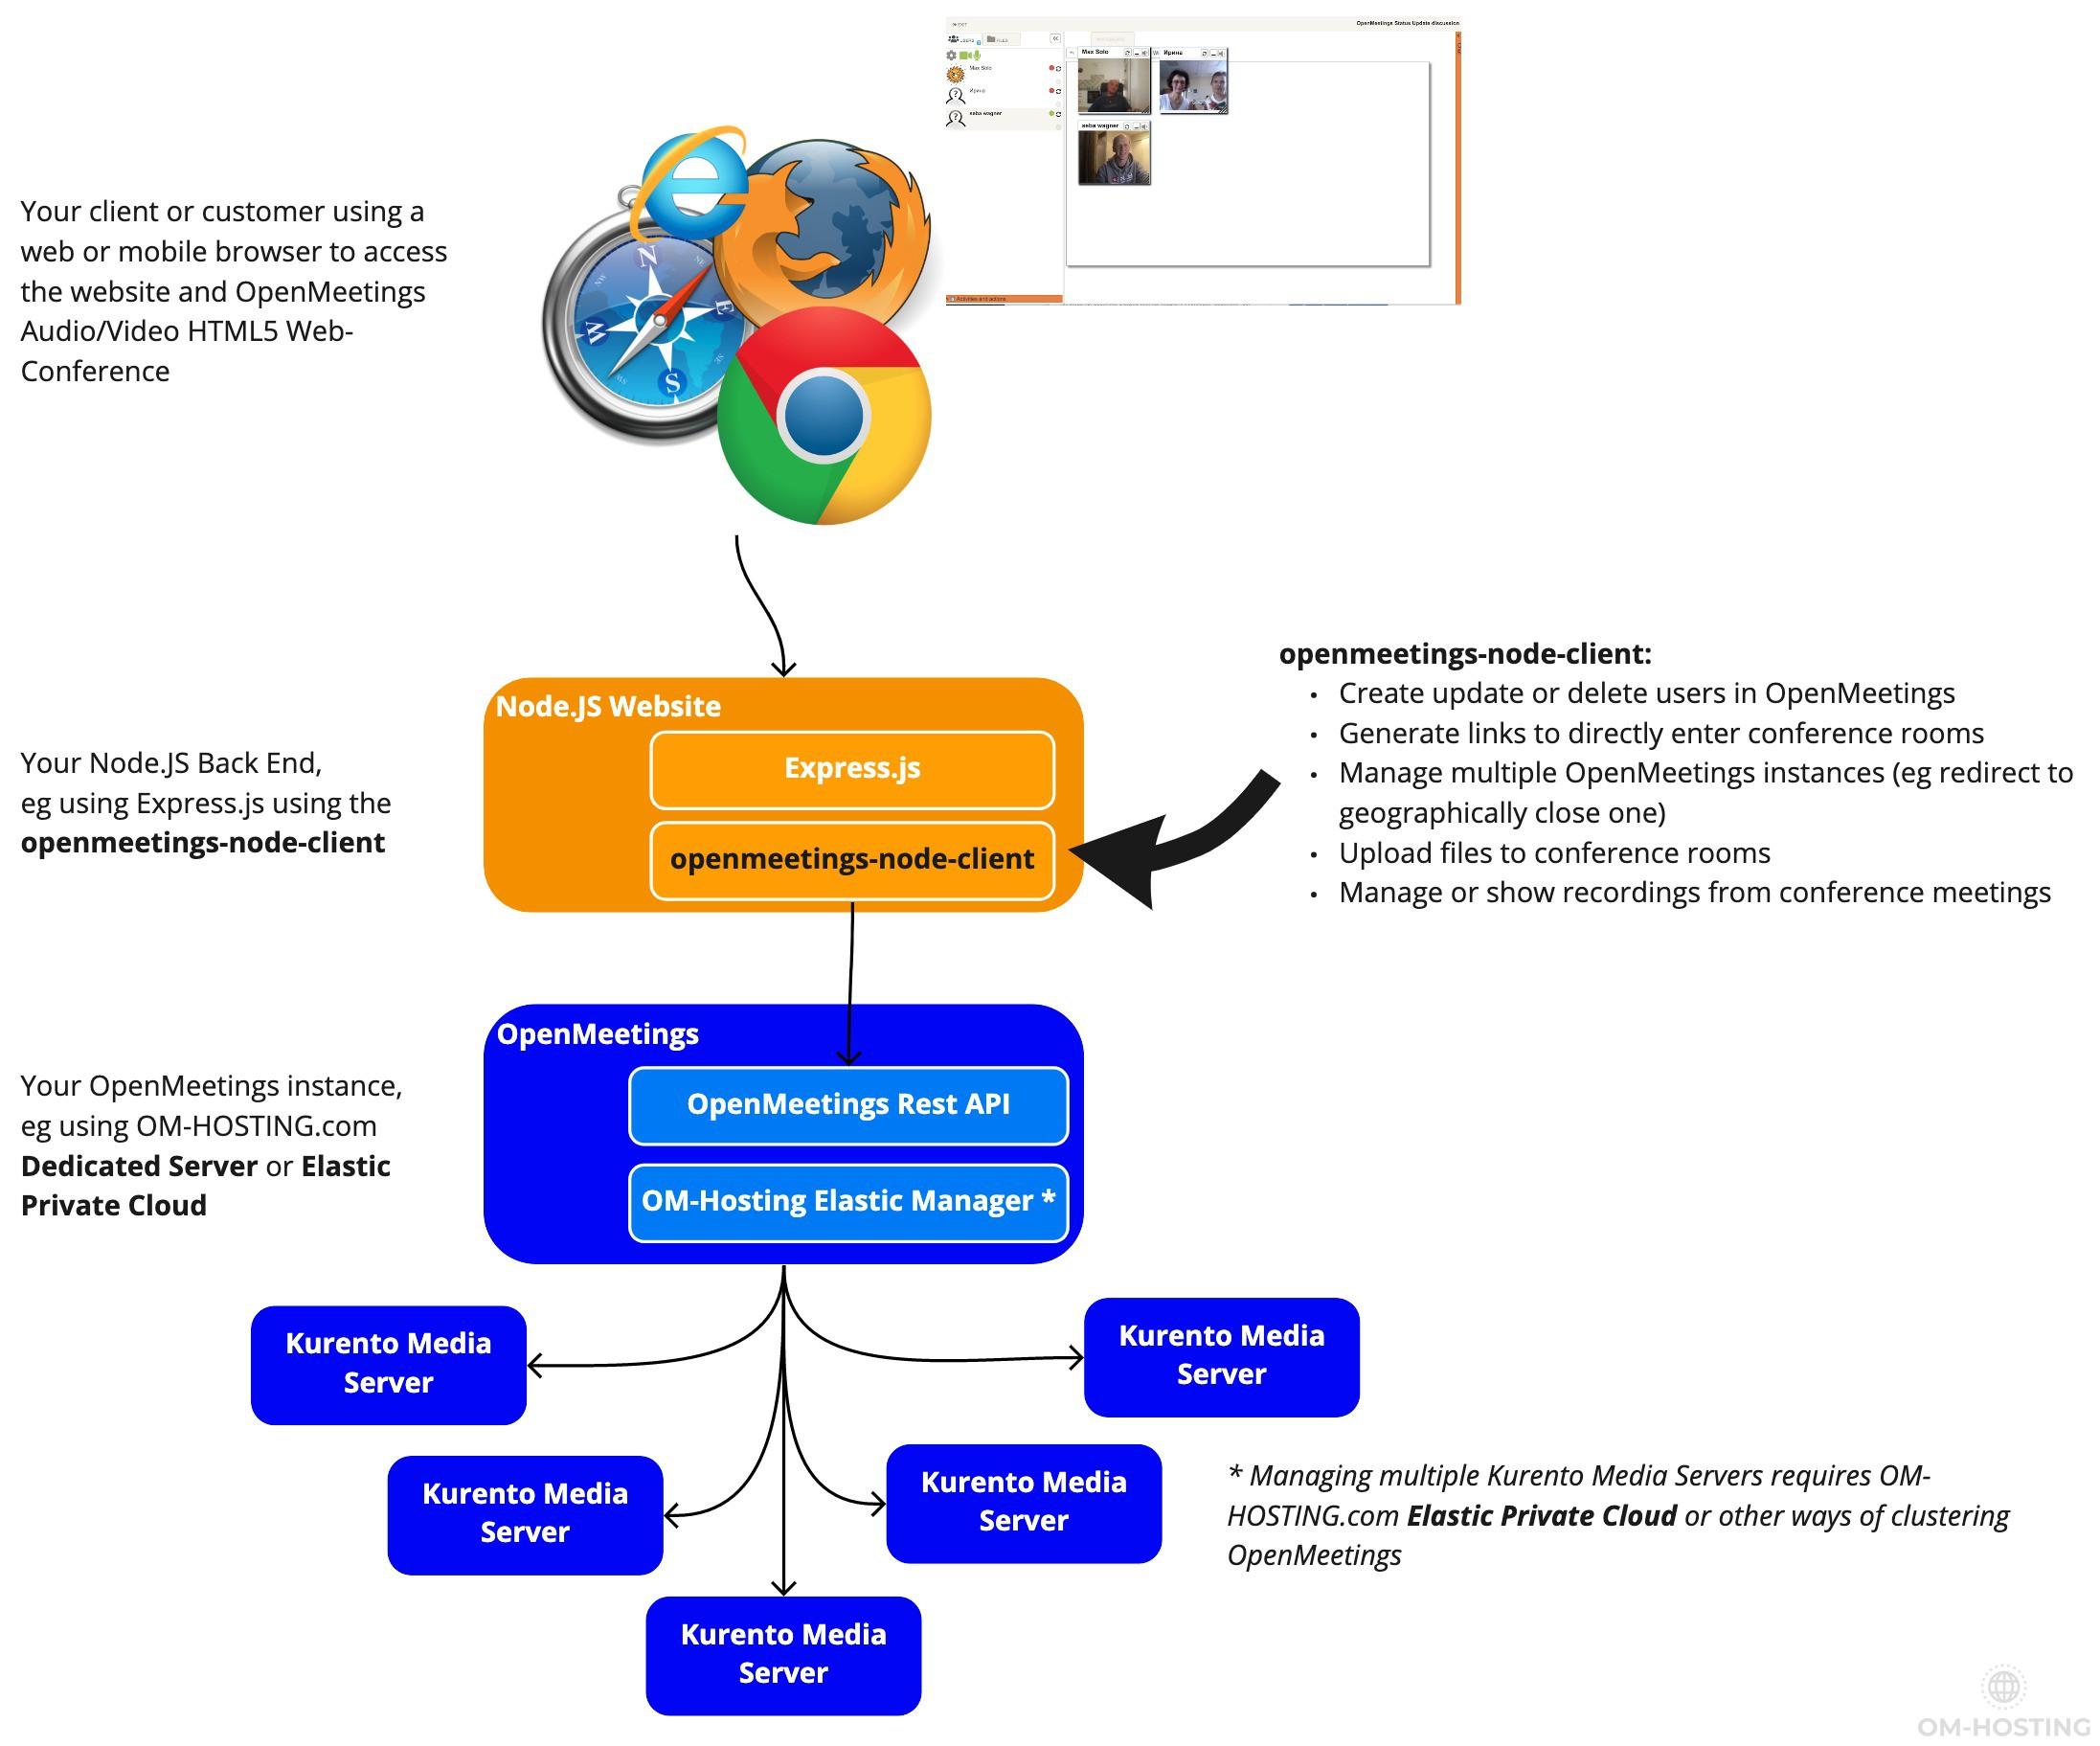 OpenMeetings Node.JS Integration Example Use-Case using Express Framework